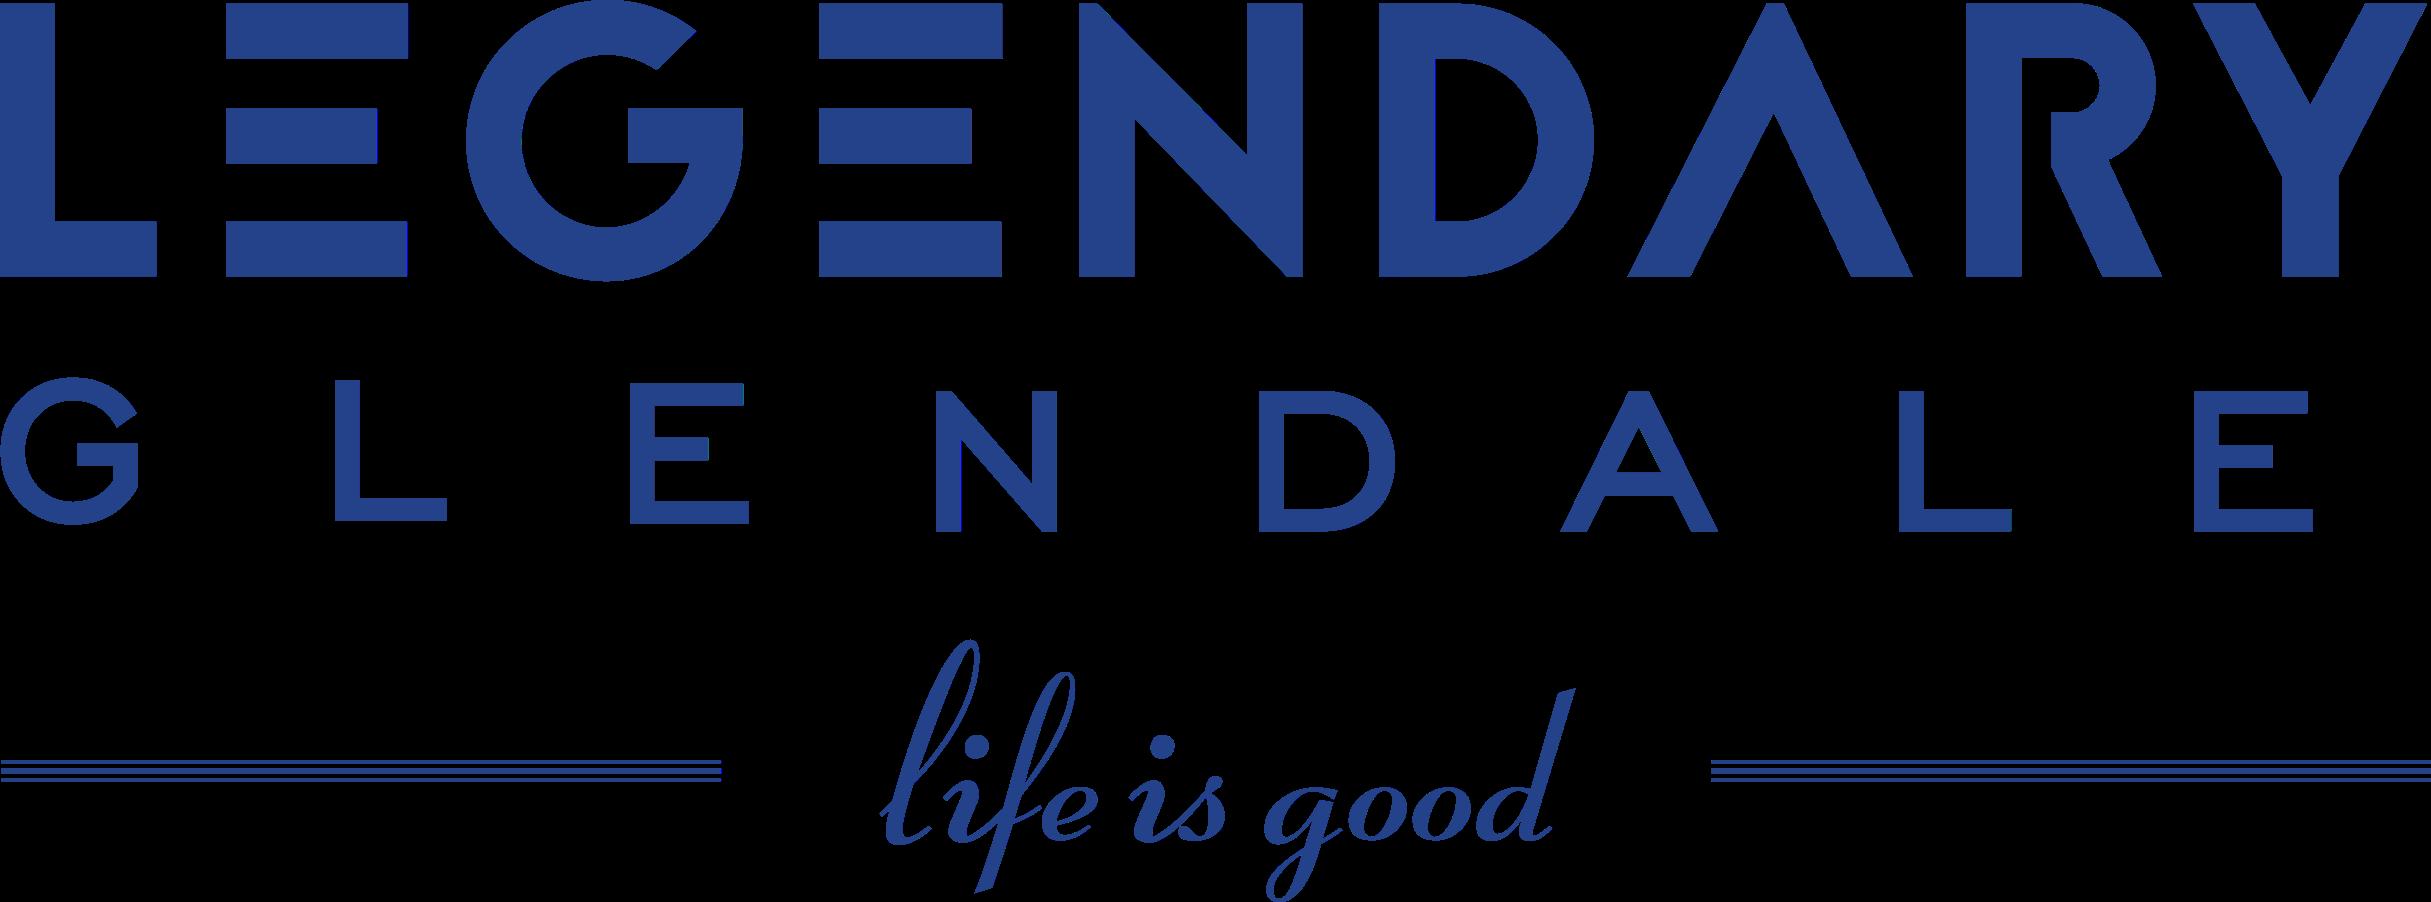 Legendary Glendale Logo, Luxury Apartments in Glendale, CA